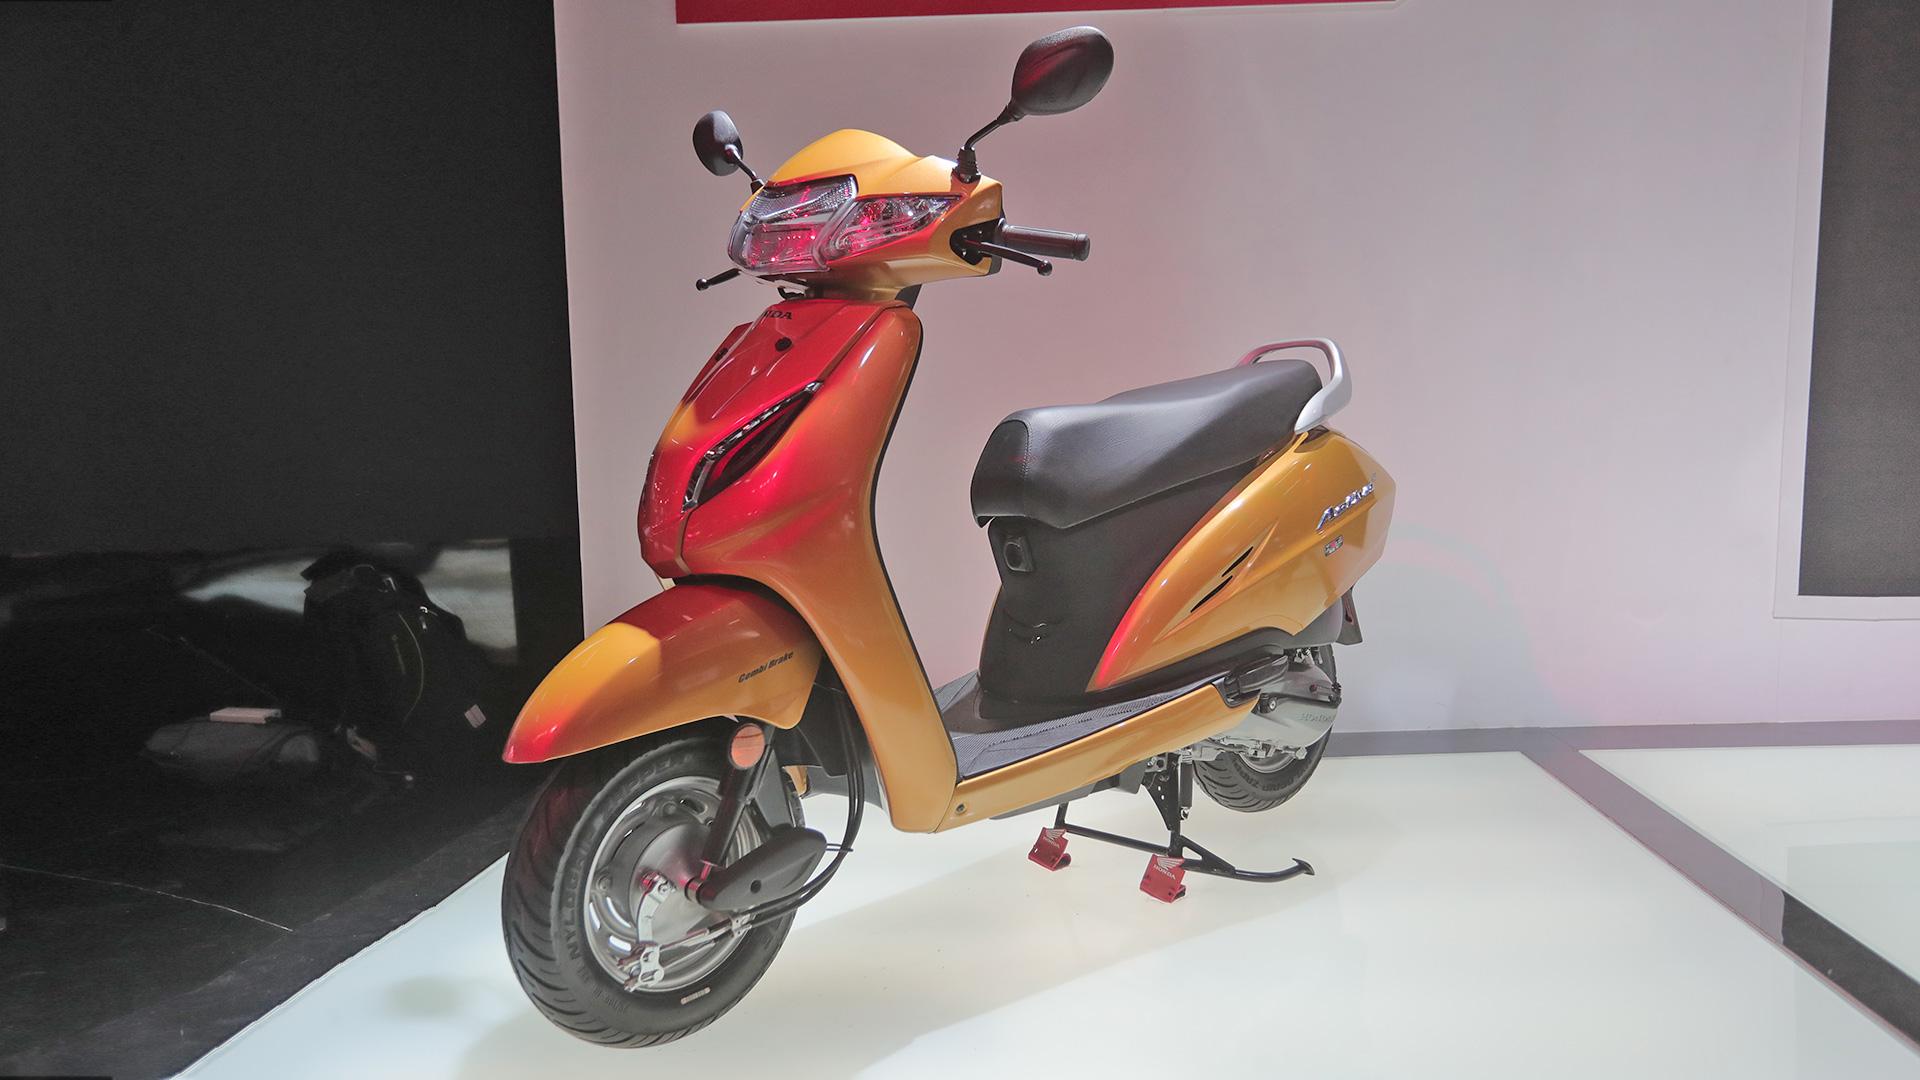 Honda Activa 5G 2018 DLX